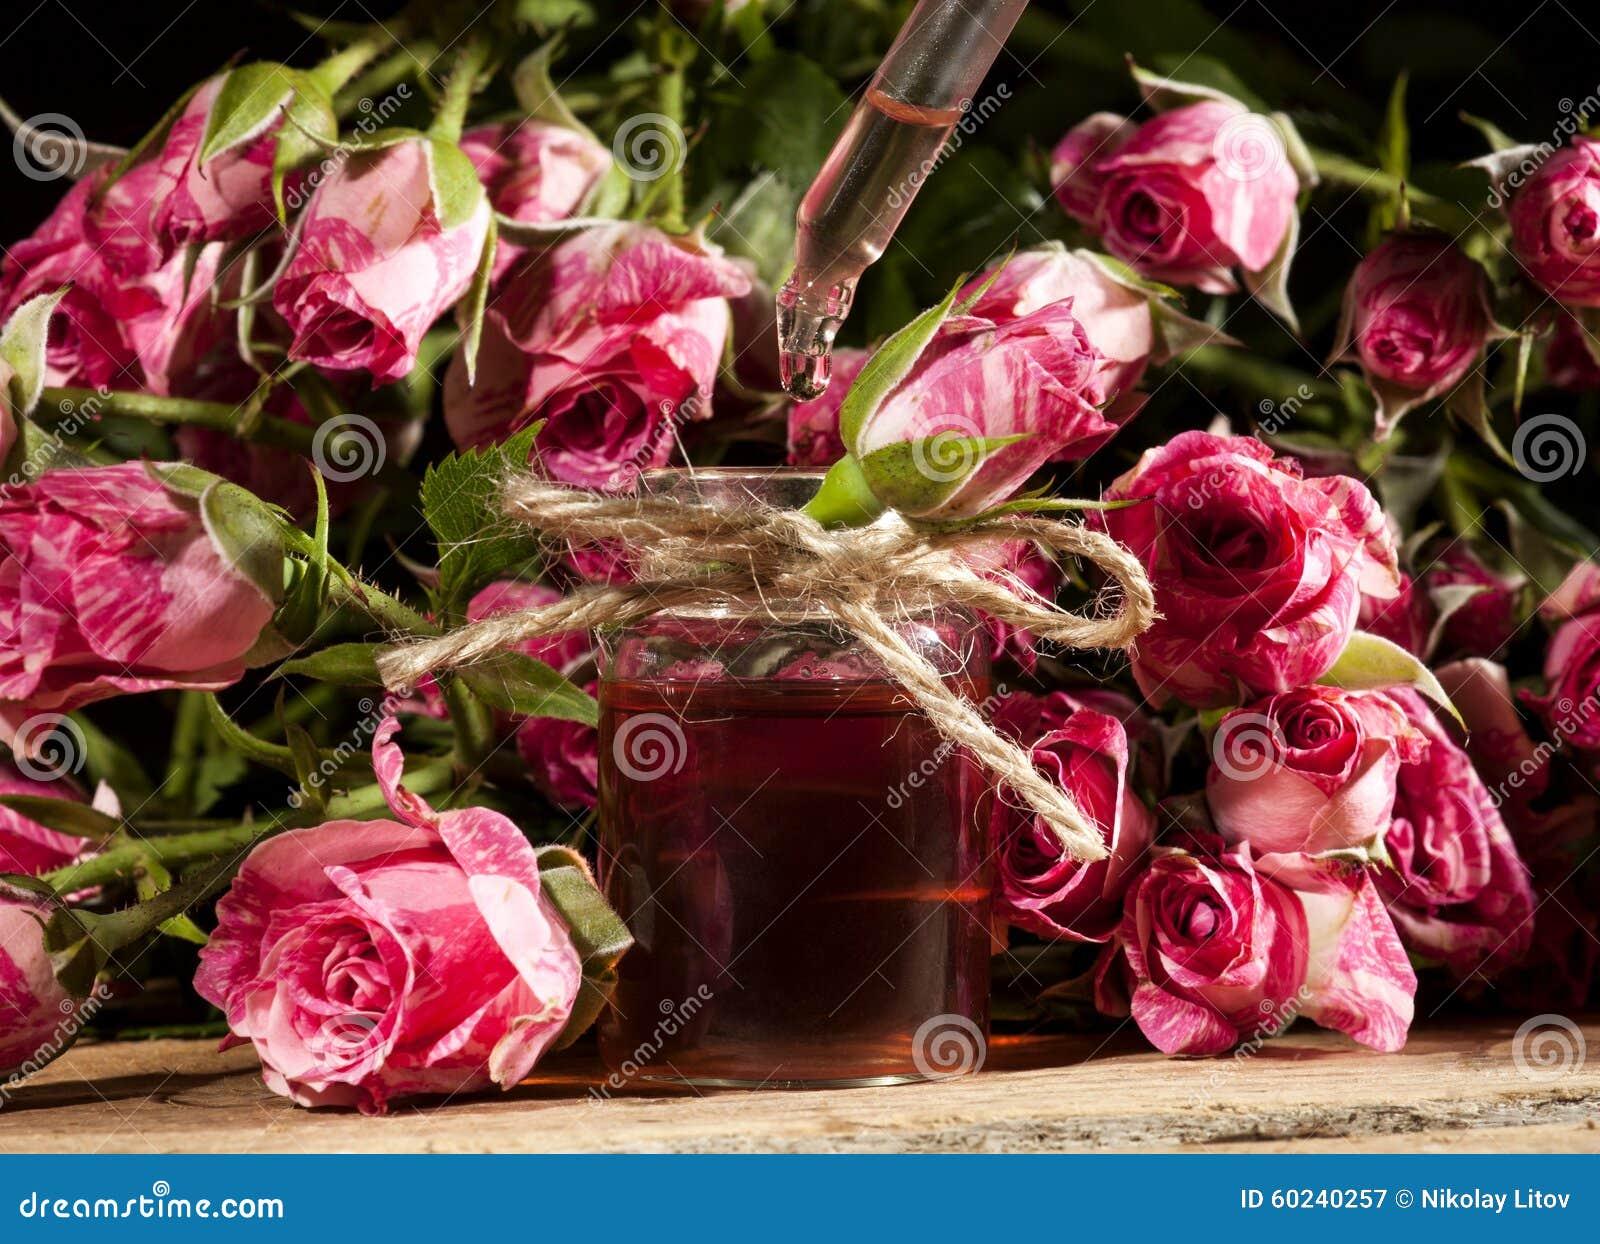 Rose Essential Oil Stock Photo Image 60240257